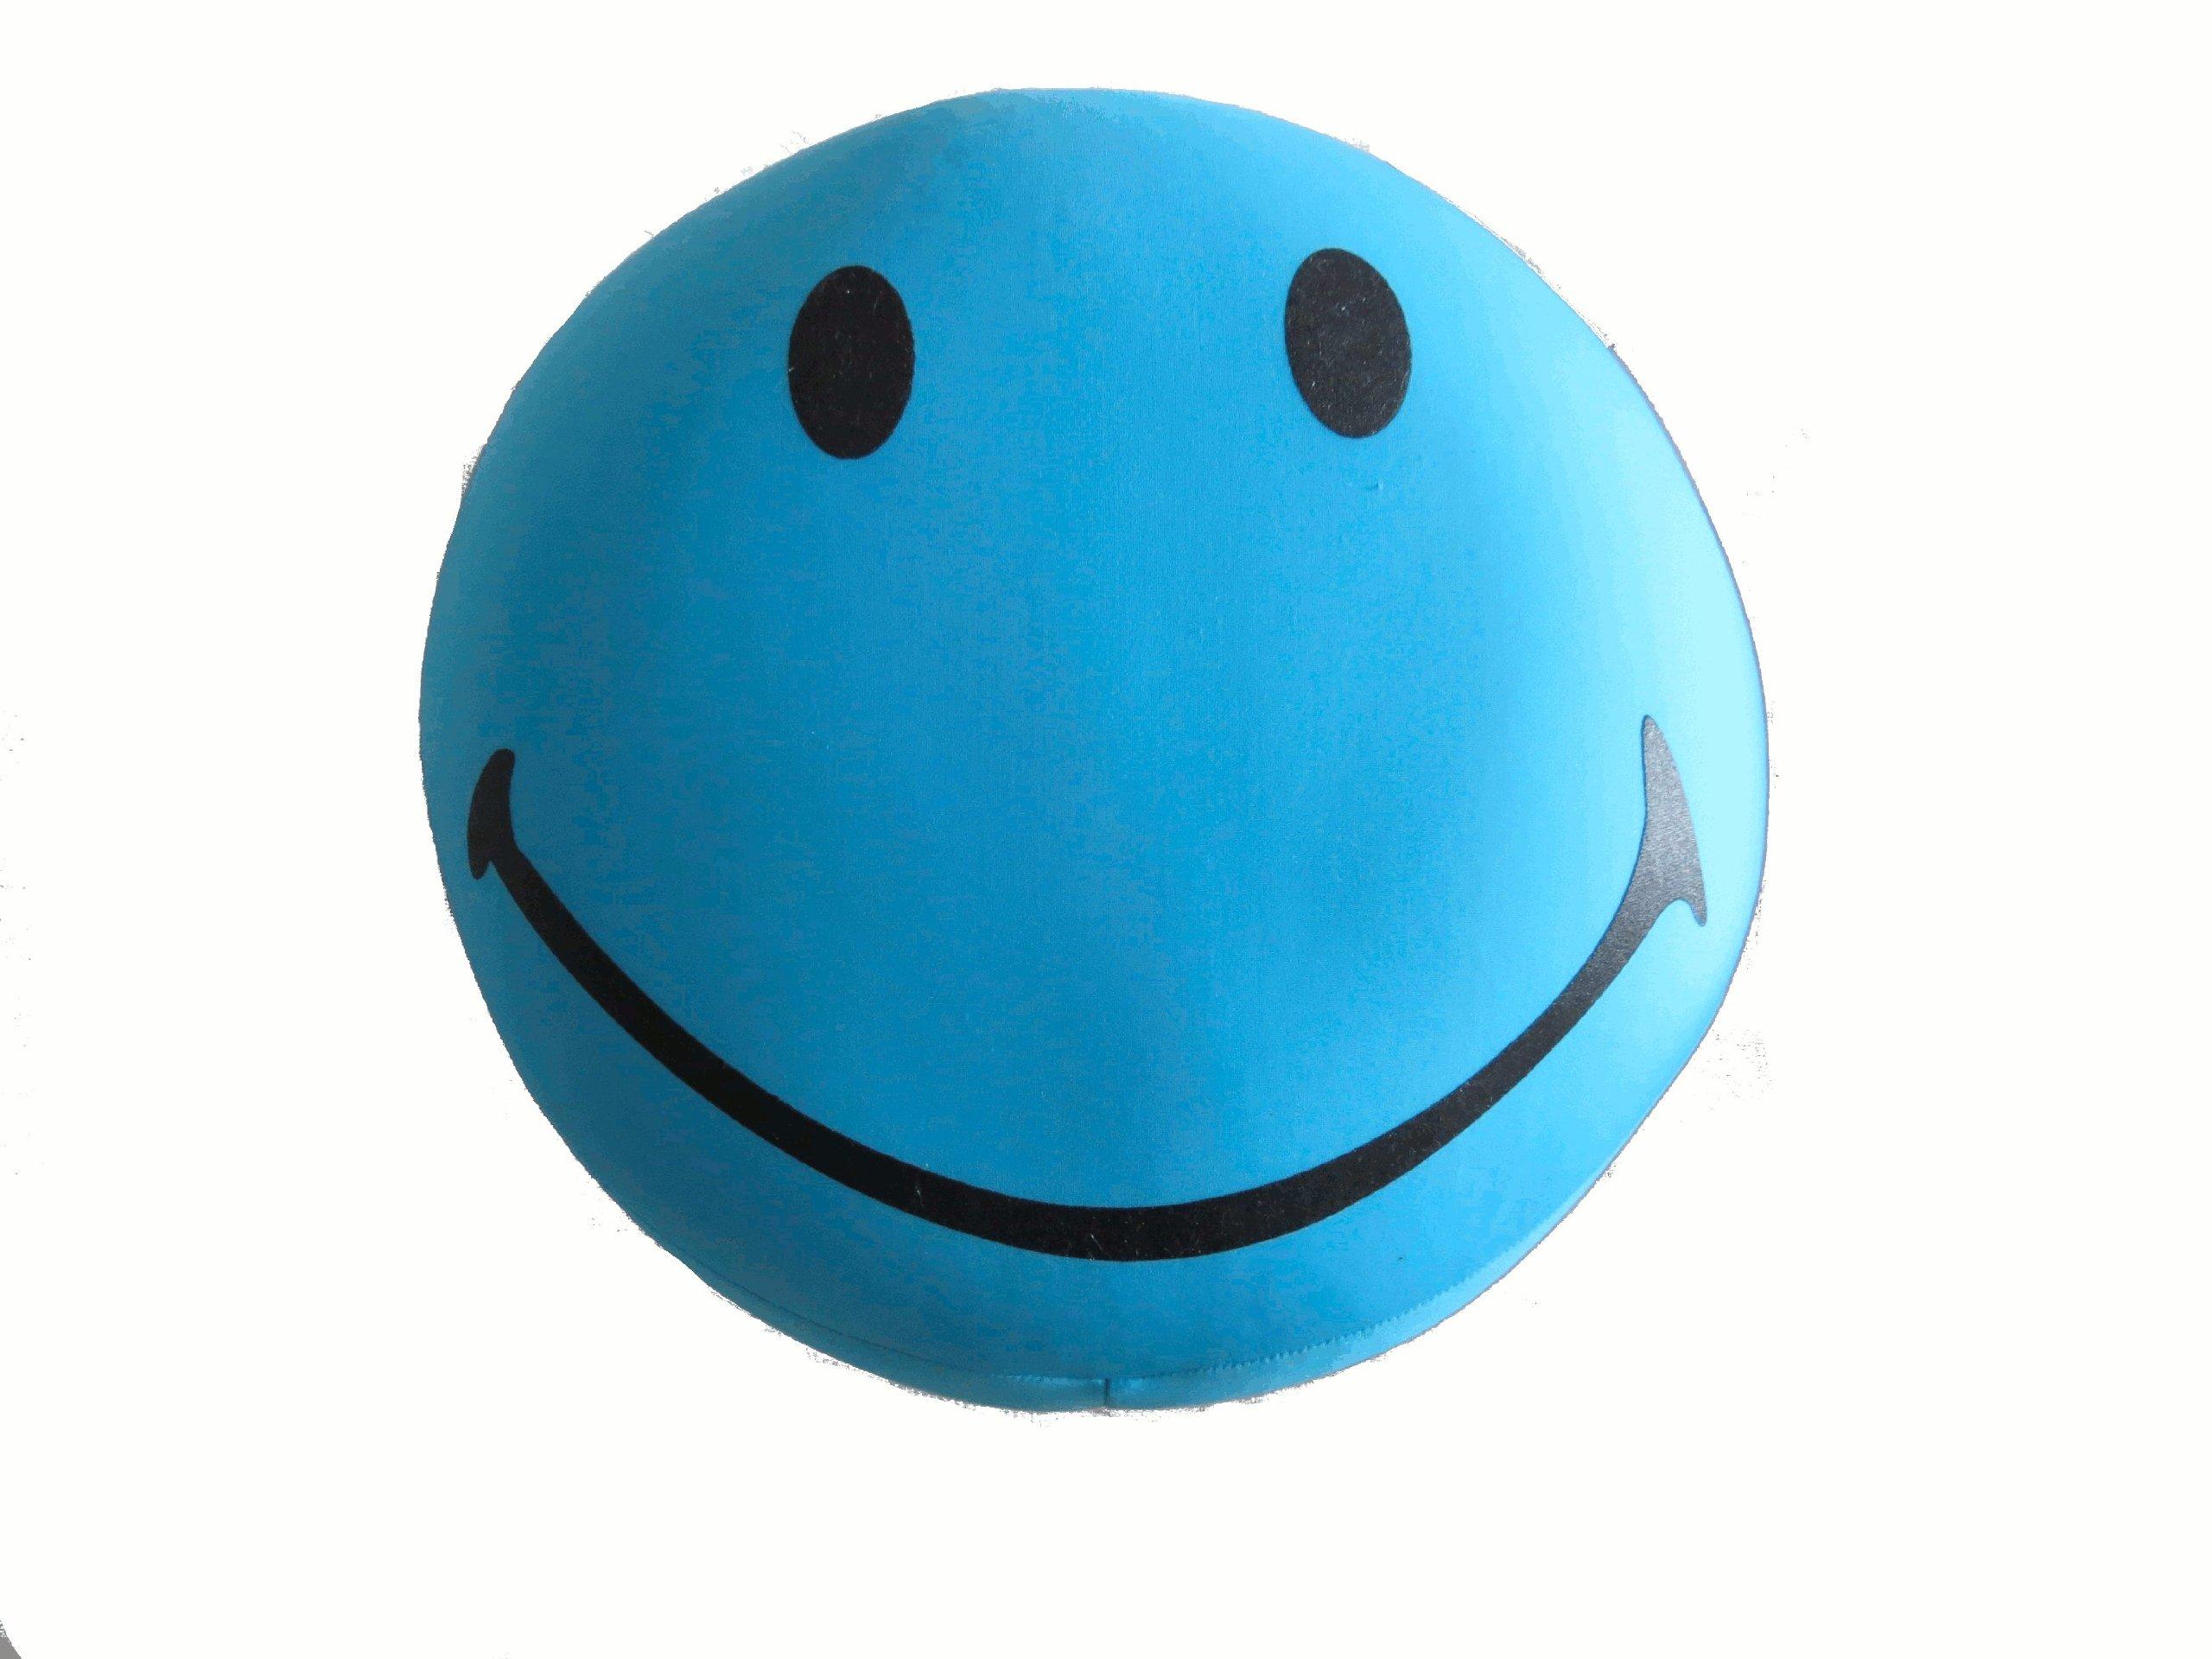 Tache Fun Squishy Smiley Face Microbead Pillow Blue